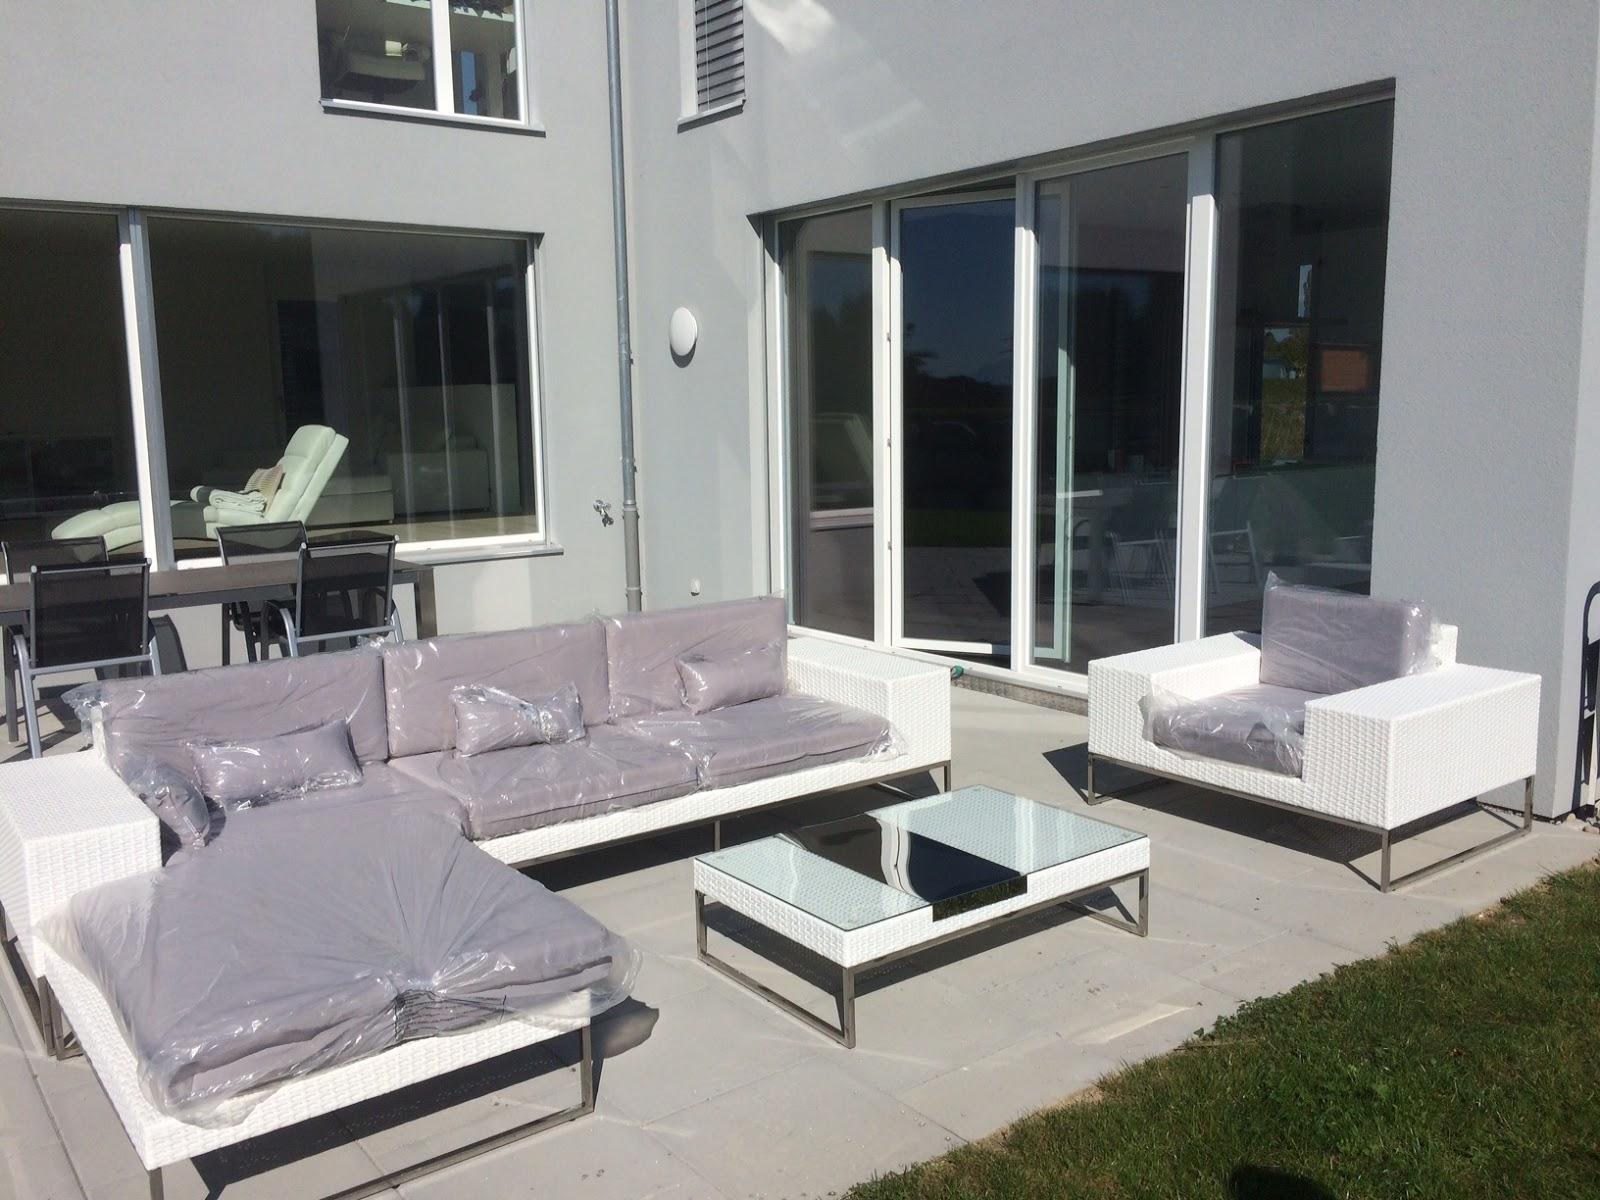 Design Lounge Tuin Bank.Beroemd Tuinbank Kunststof Design Rif29 Agneswamu